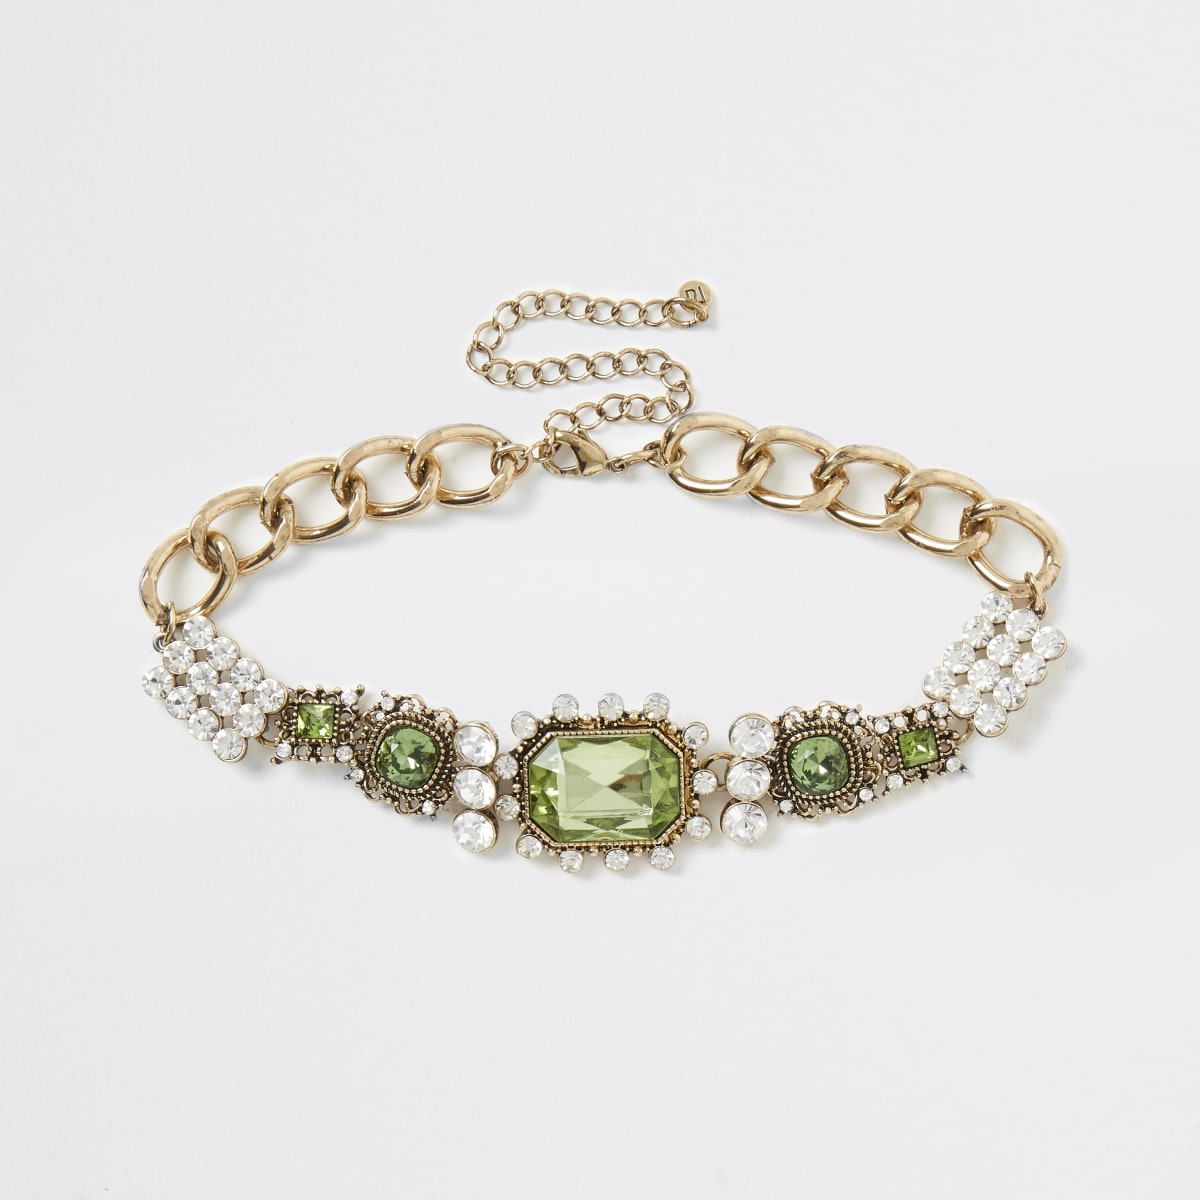 Collier tendance vert orné de bijoux